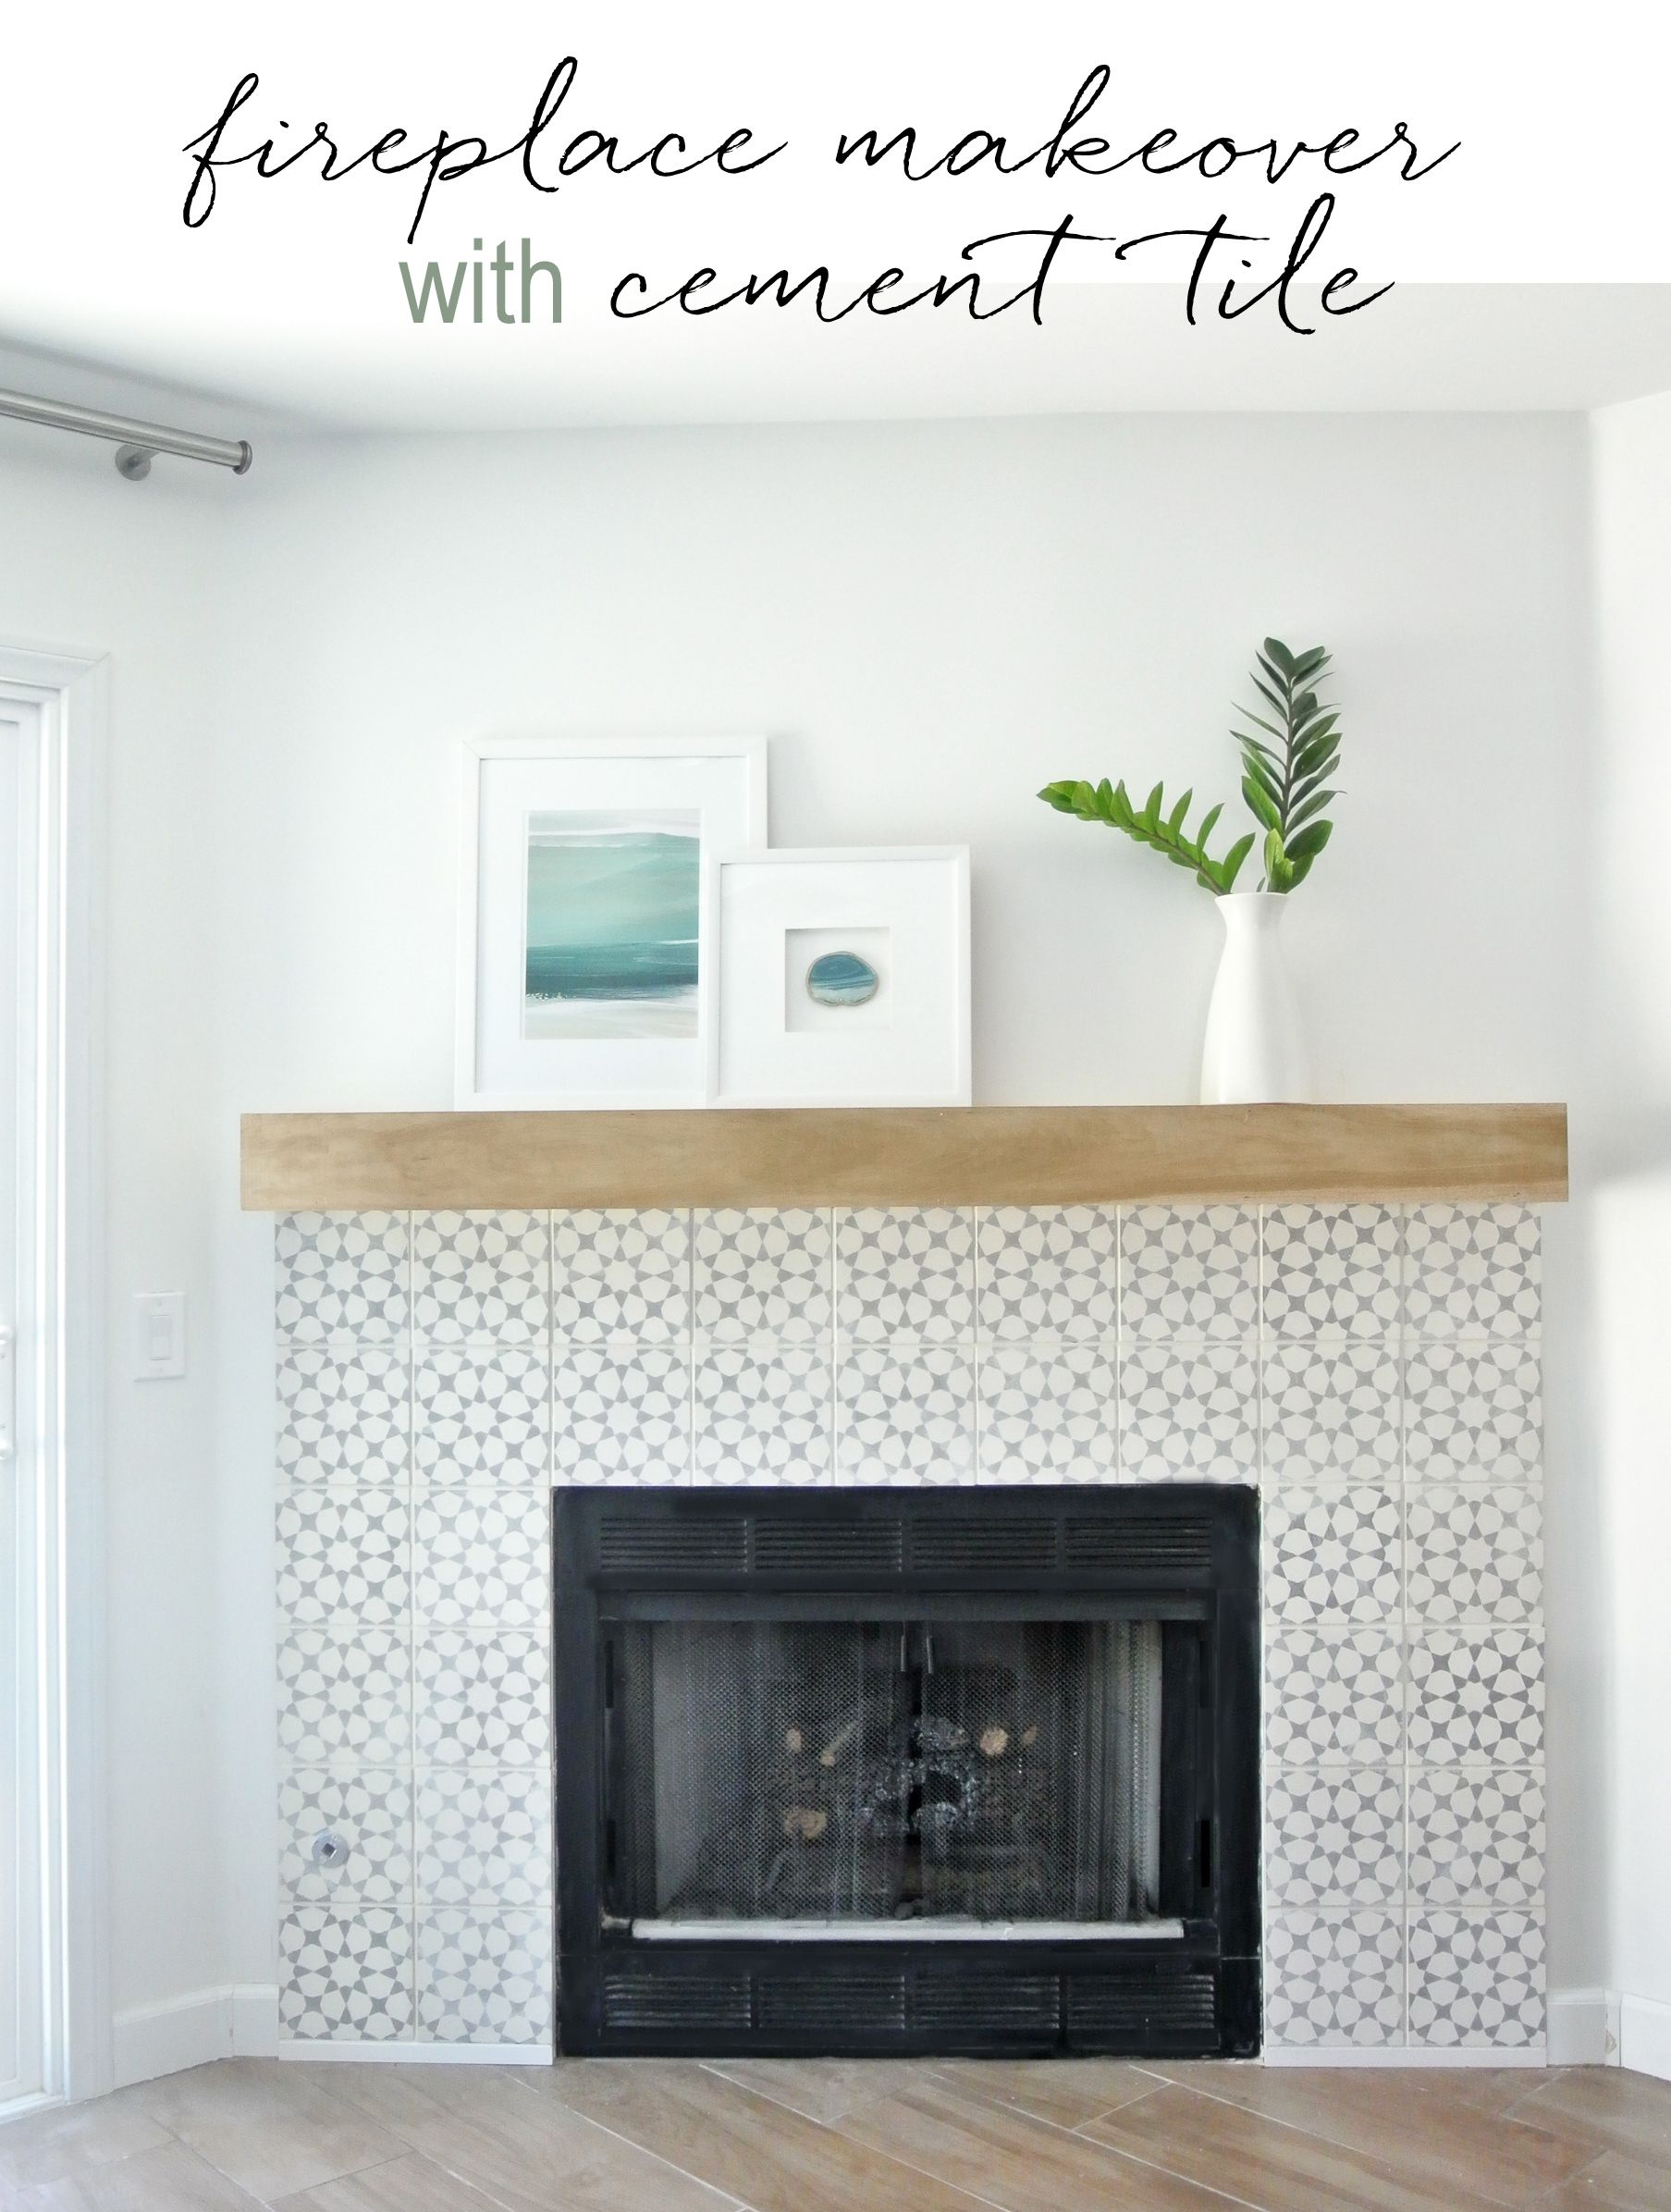 ideas tile glass surround dma fireplace diy plans harmonious woodworking pdf homes